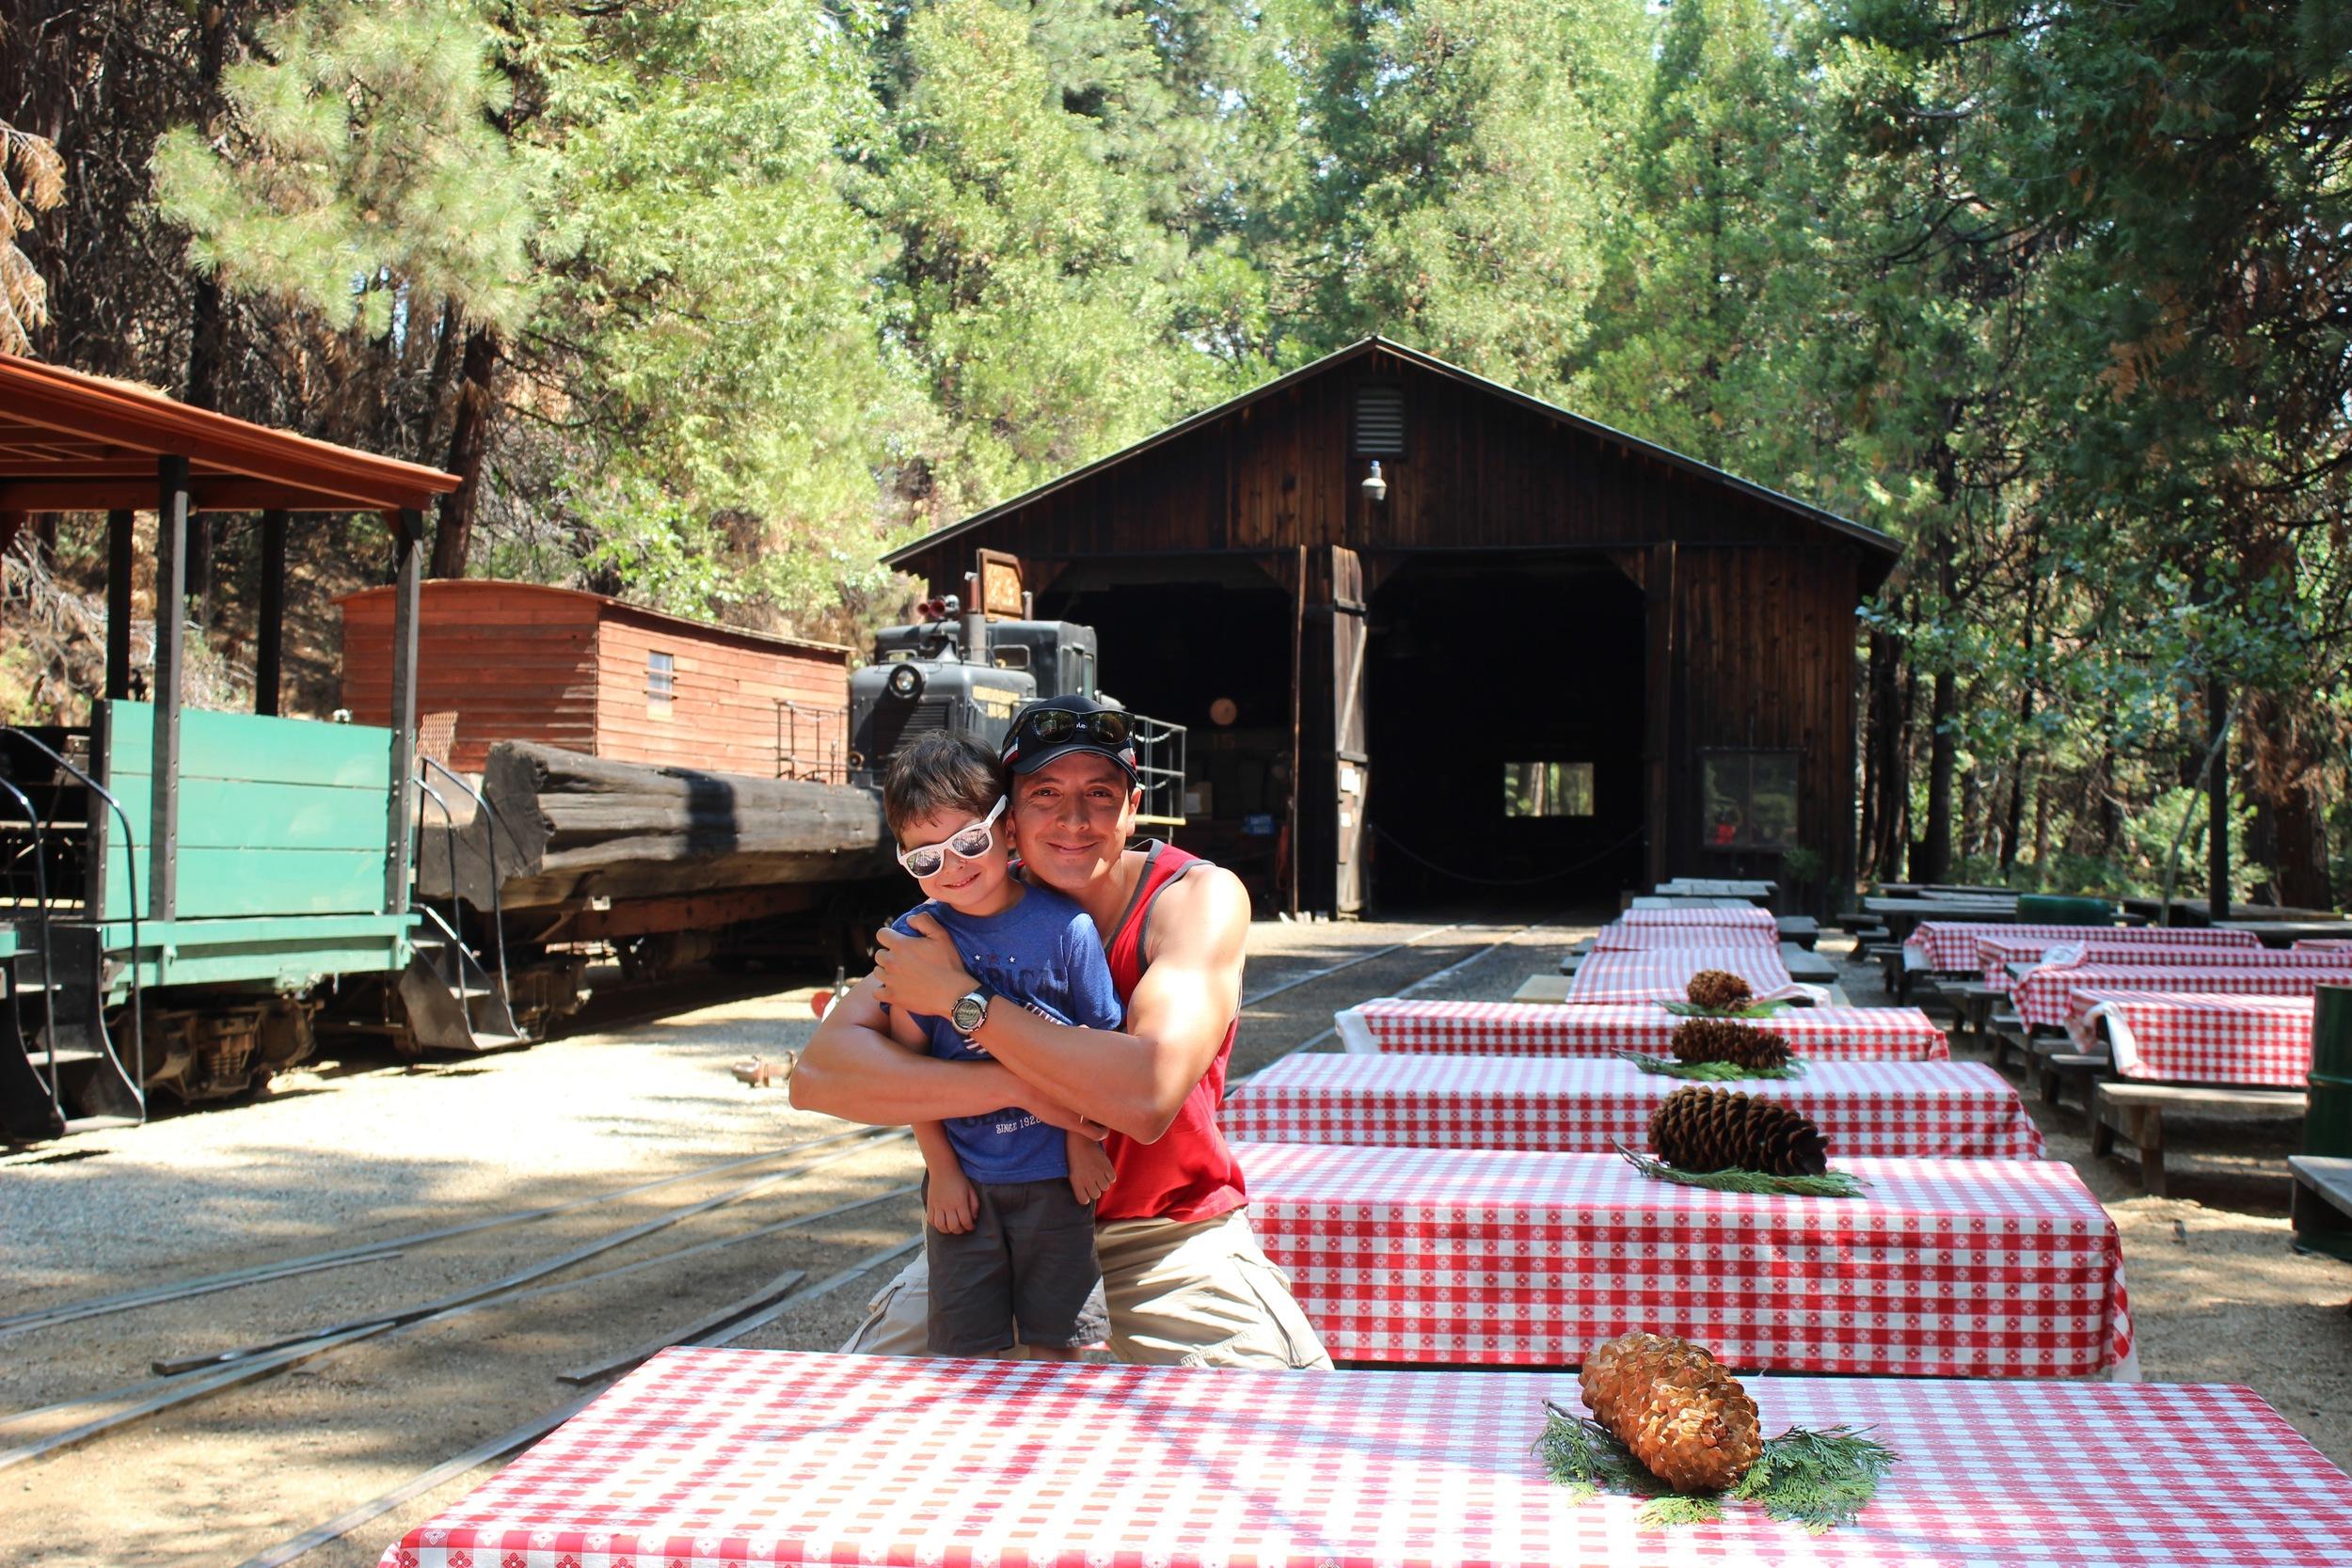 Coarsegold_Ca_KOA_Camping August_201567.jpg